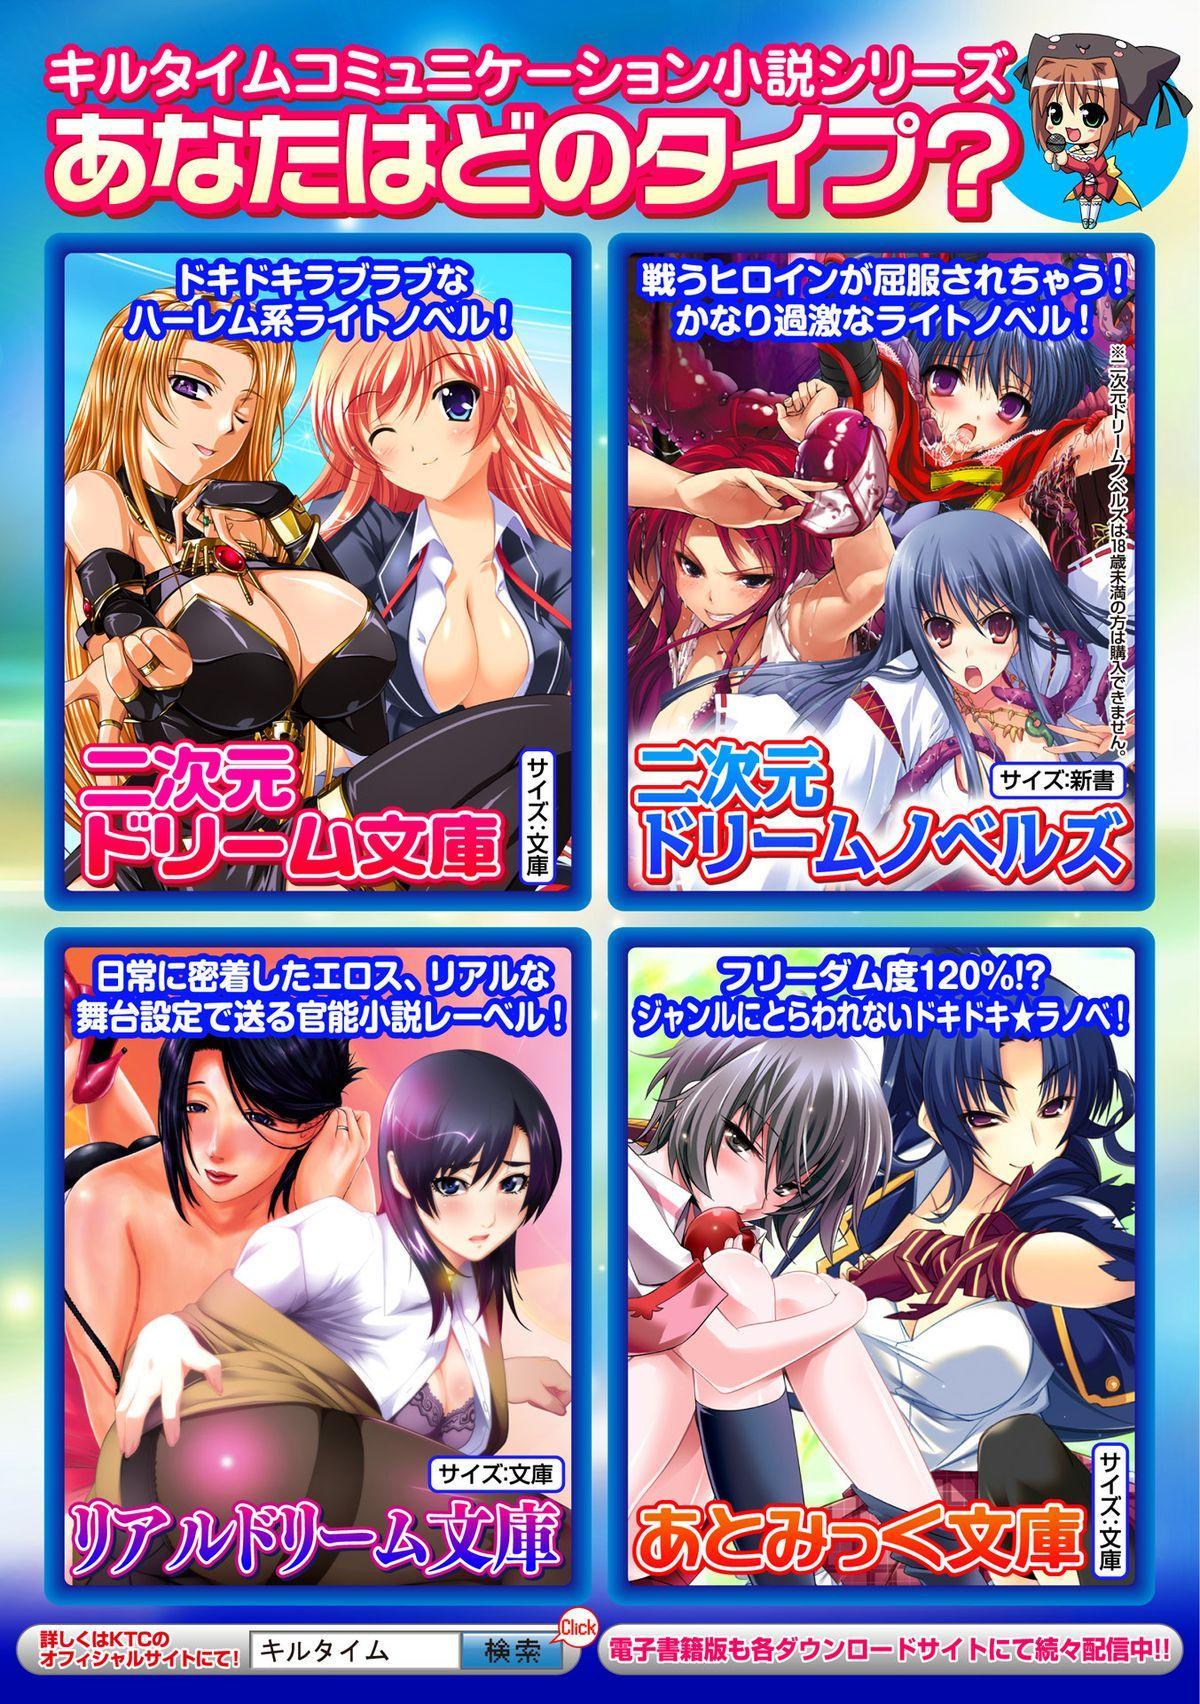 2D Comic Magazine Kusurizuke SEX de Keiren Ahegao Acme! Vol. 2 86